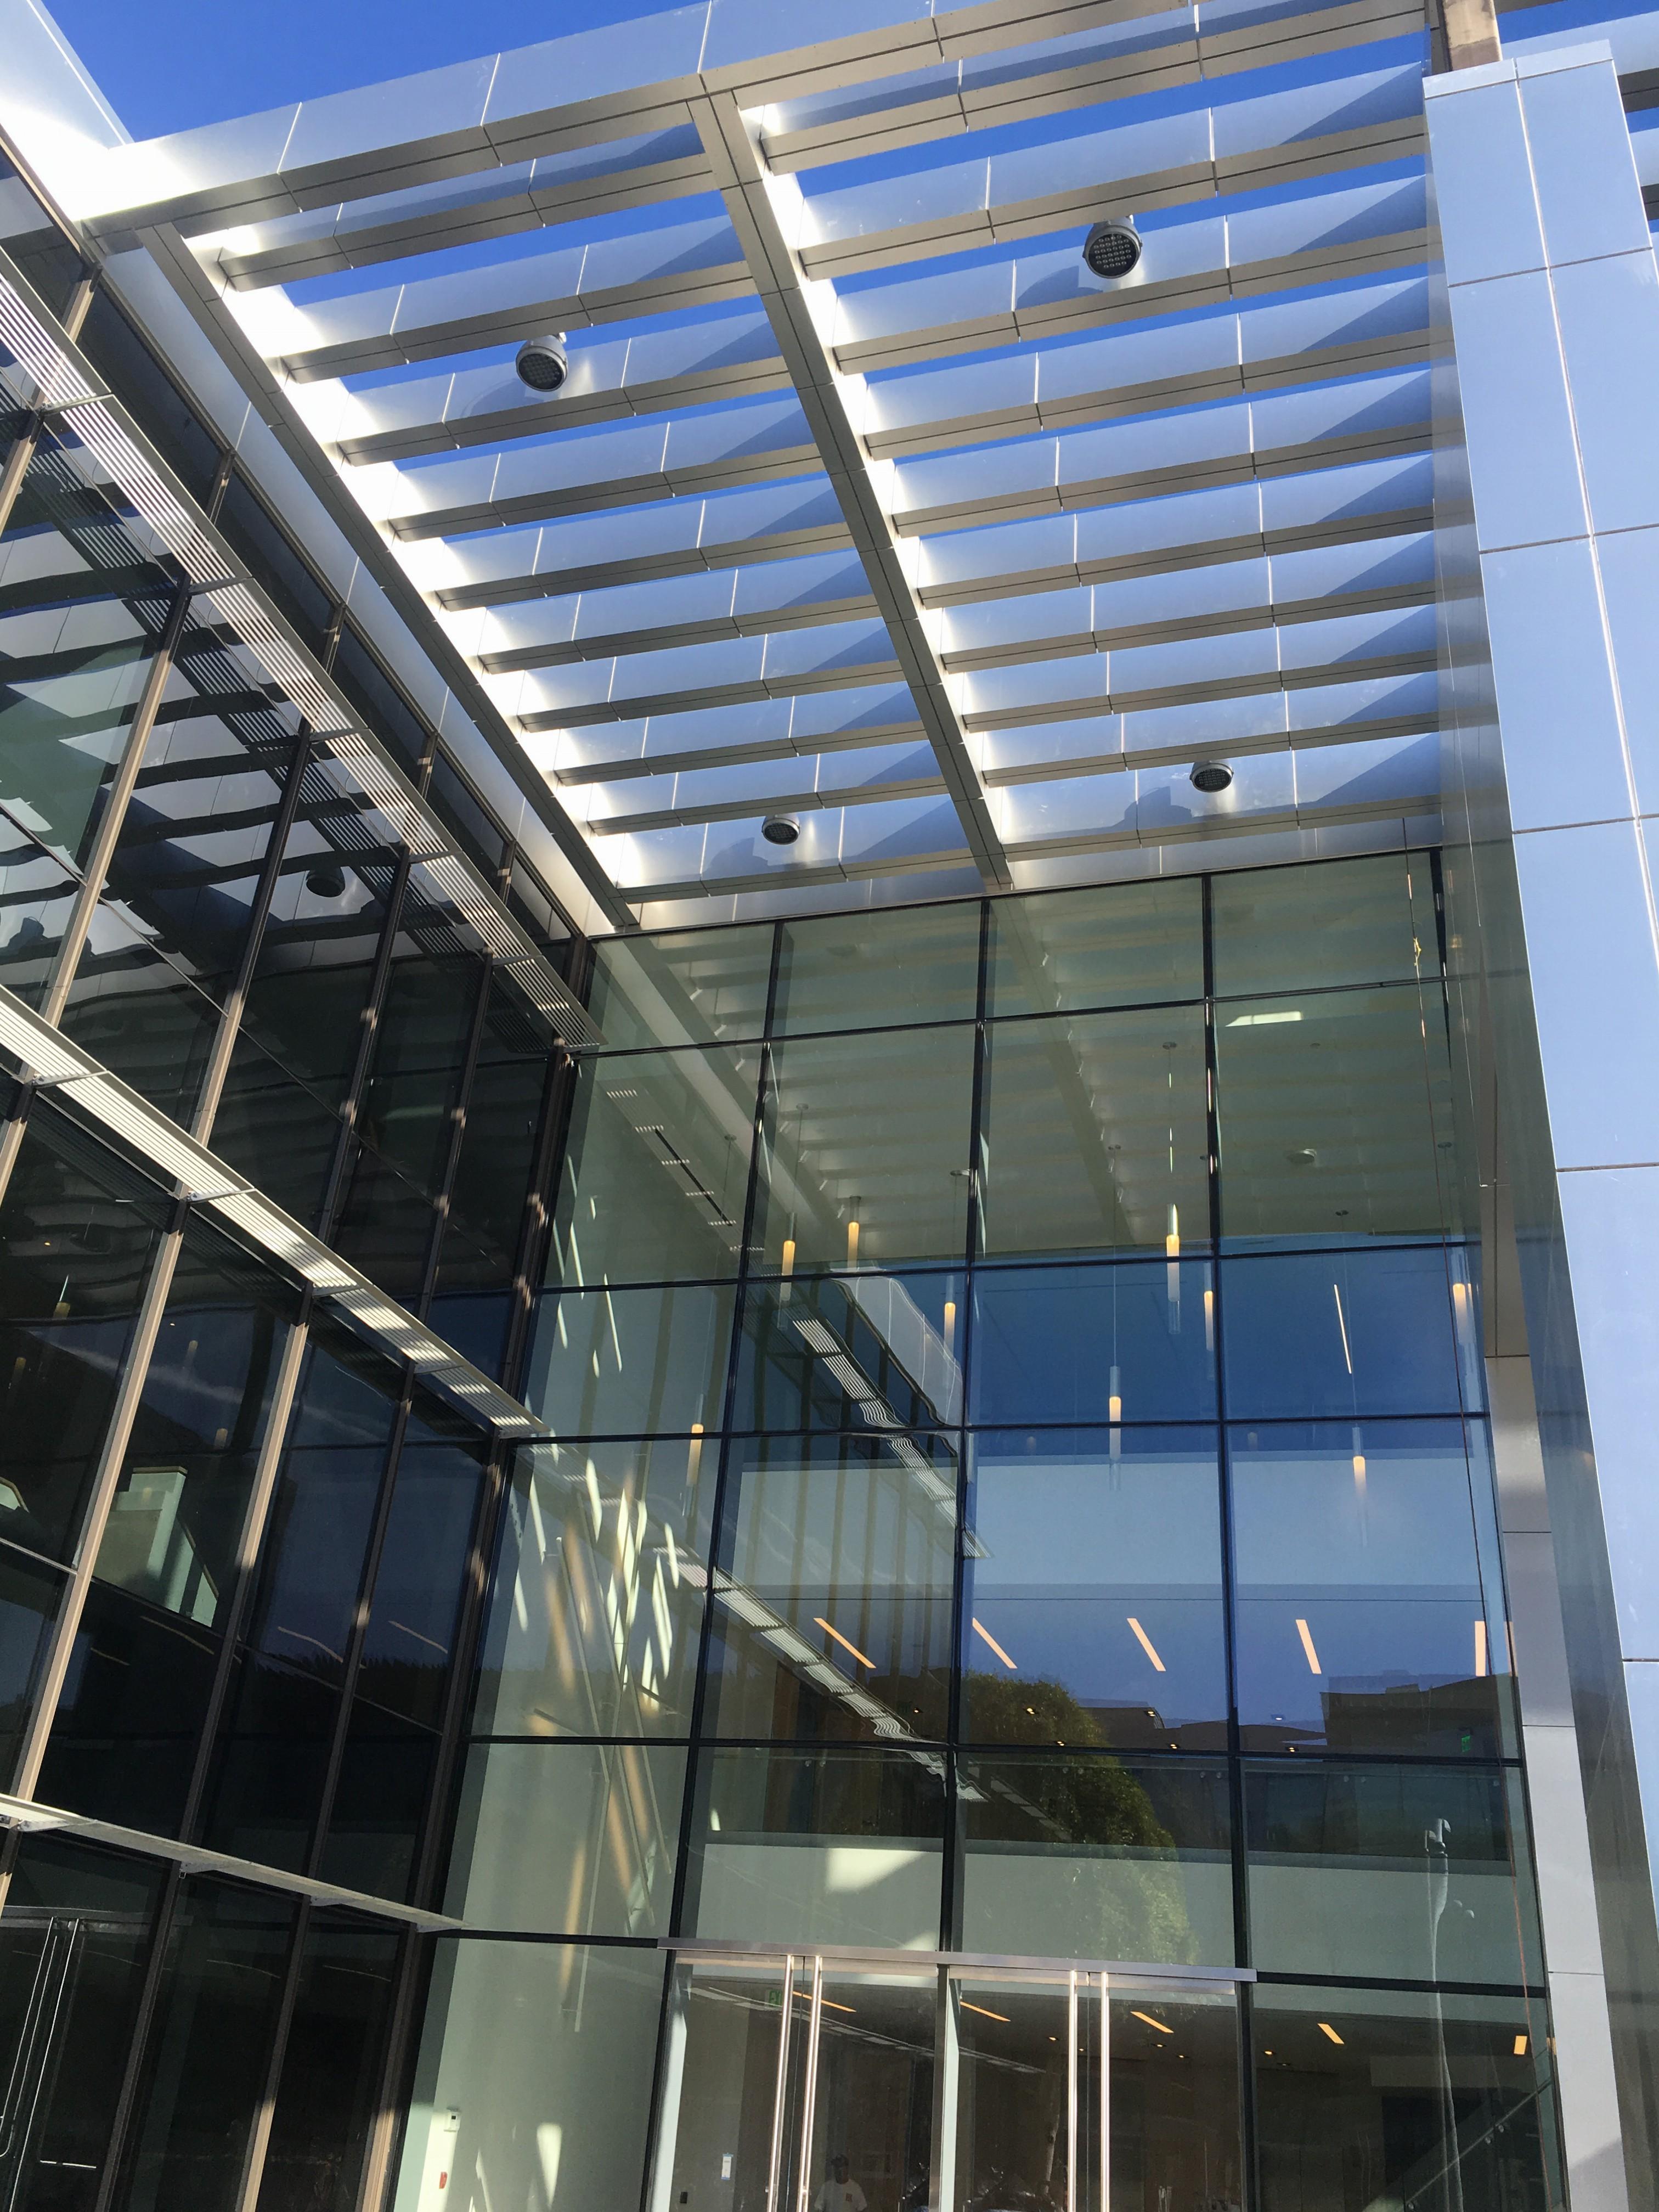 Kia Van Nuys >> C4000 rain screen panels SAF – Southern Aluminum Finishing Co, Inc.